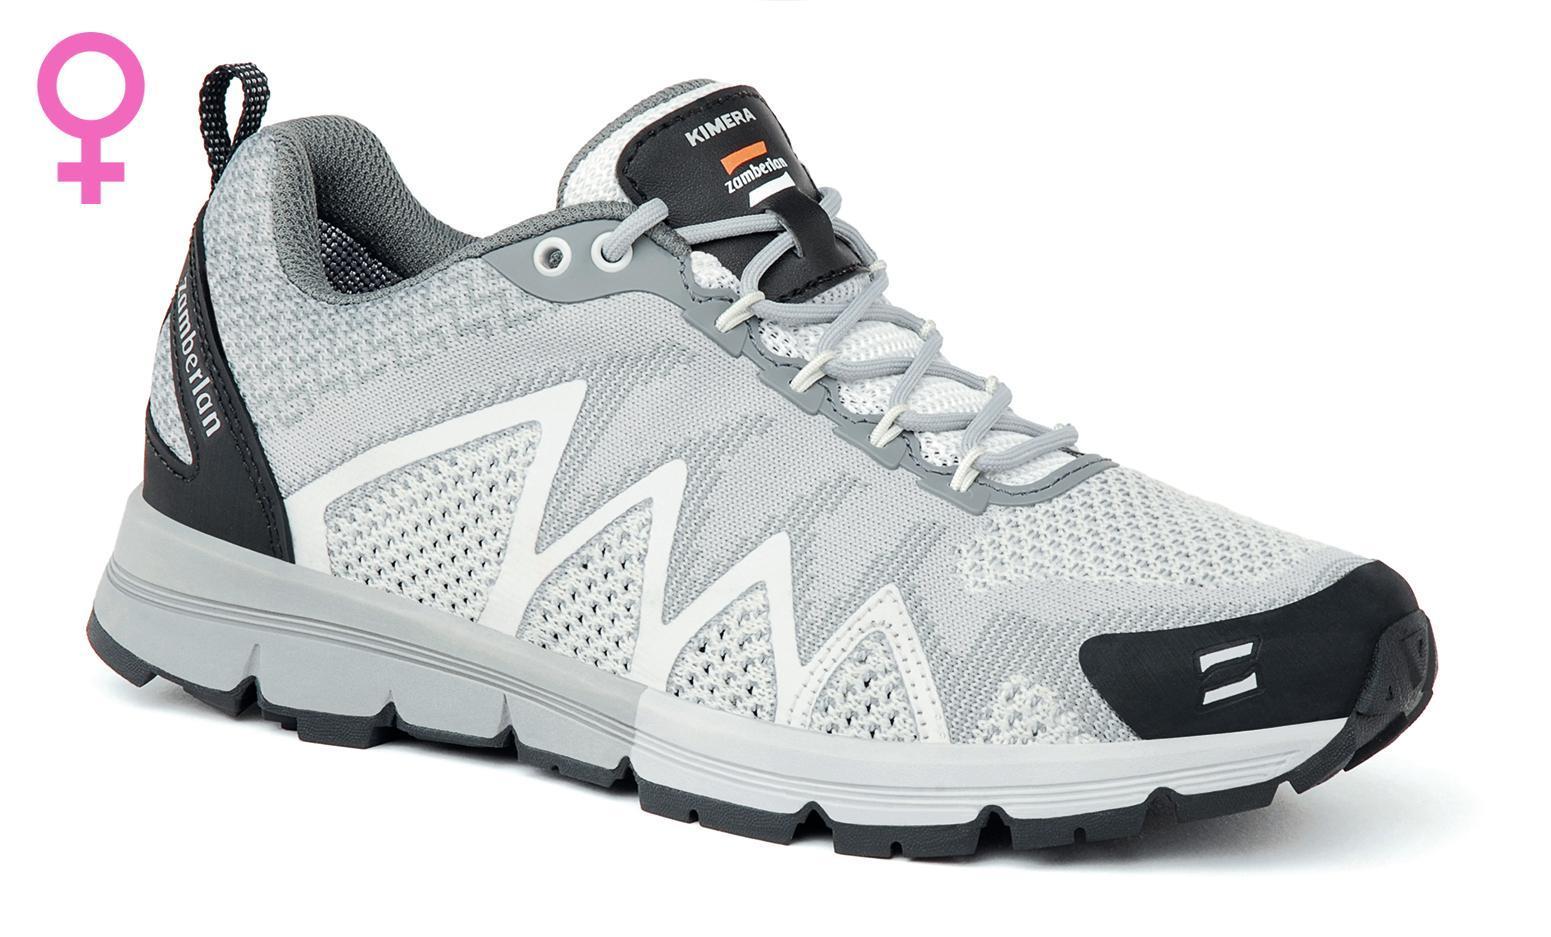 release date 884c0 5d2be 123 KIMERA RR WNS - Grey Scarpe Hiking per la donna Zamberlan